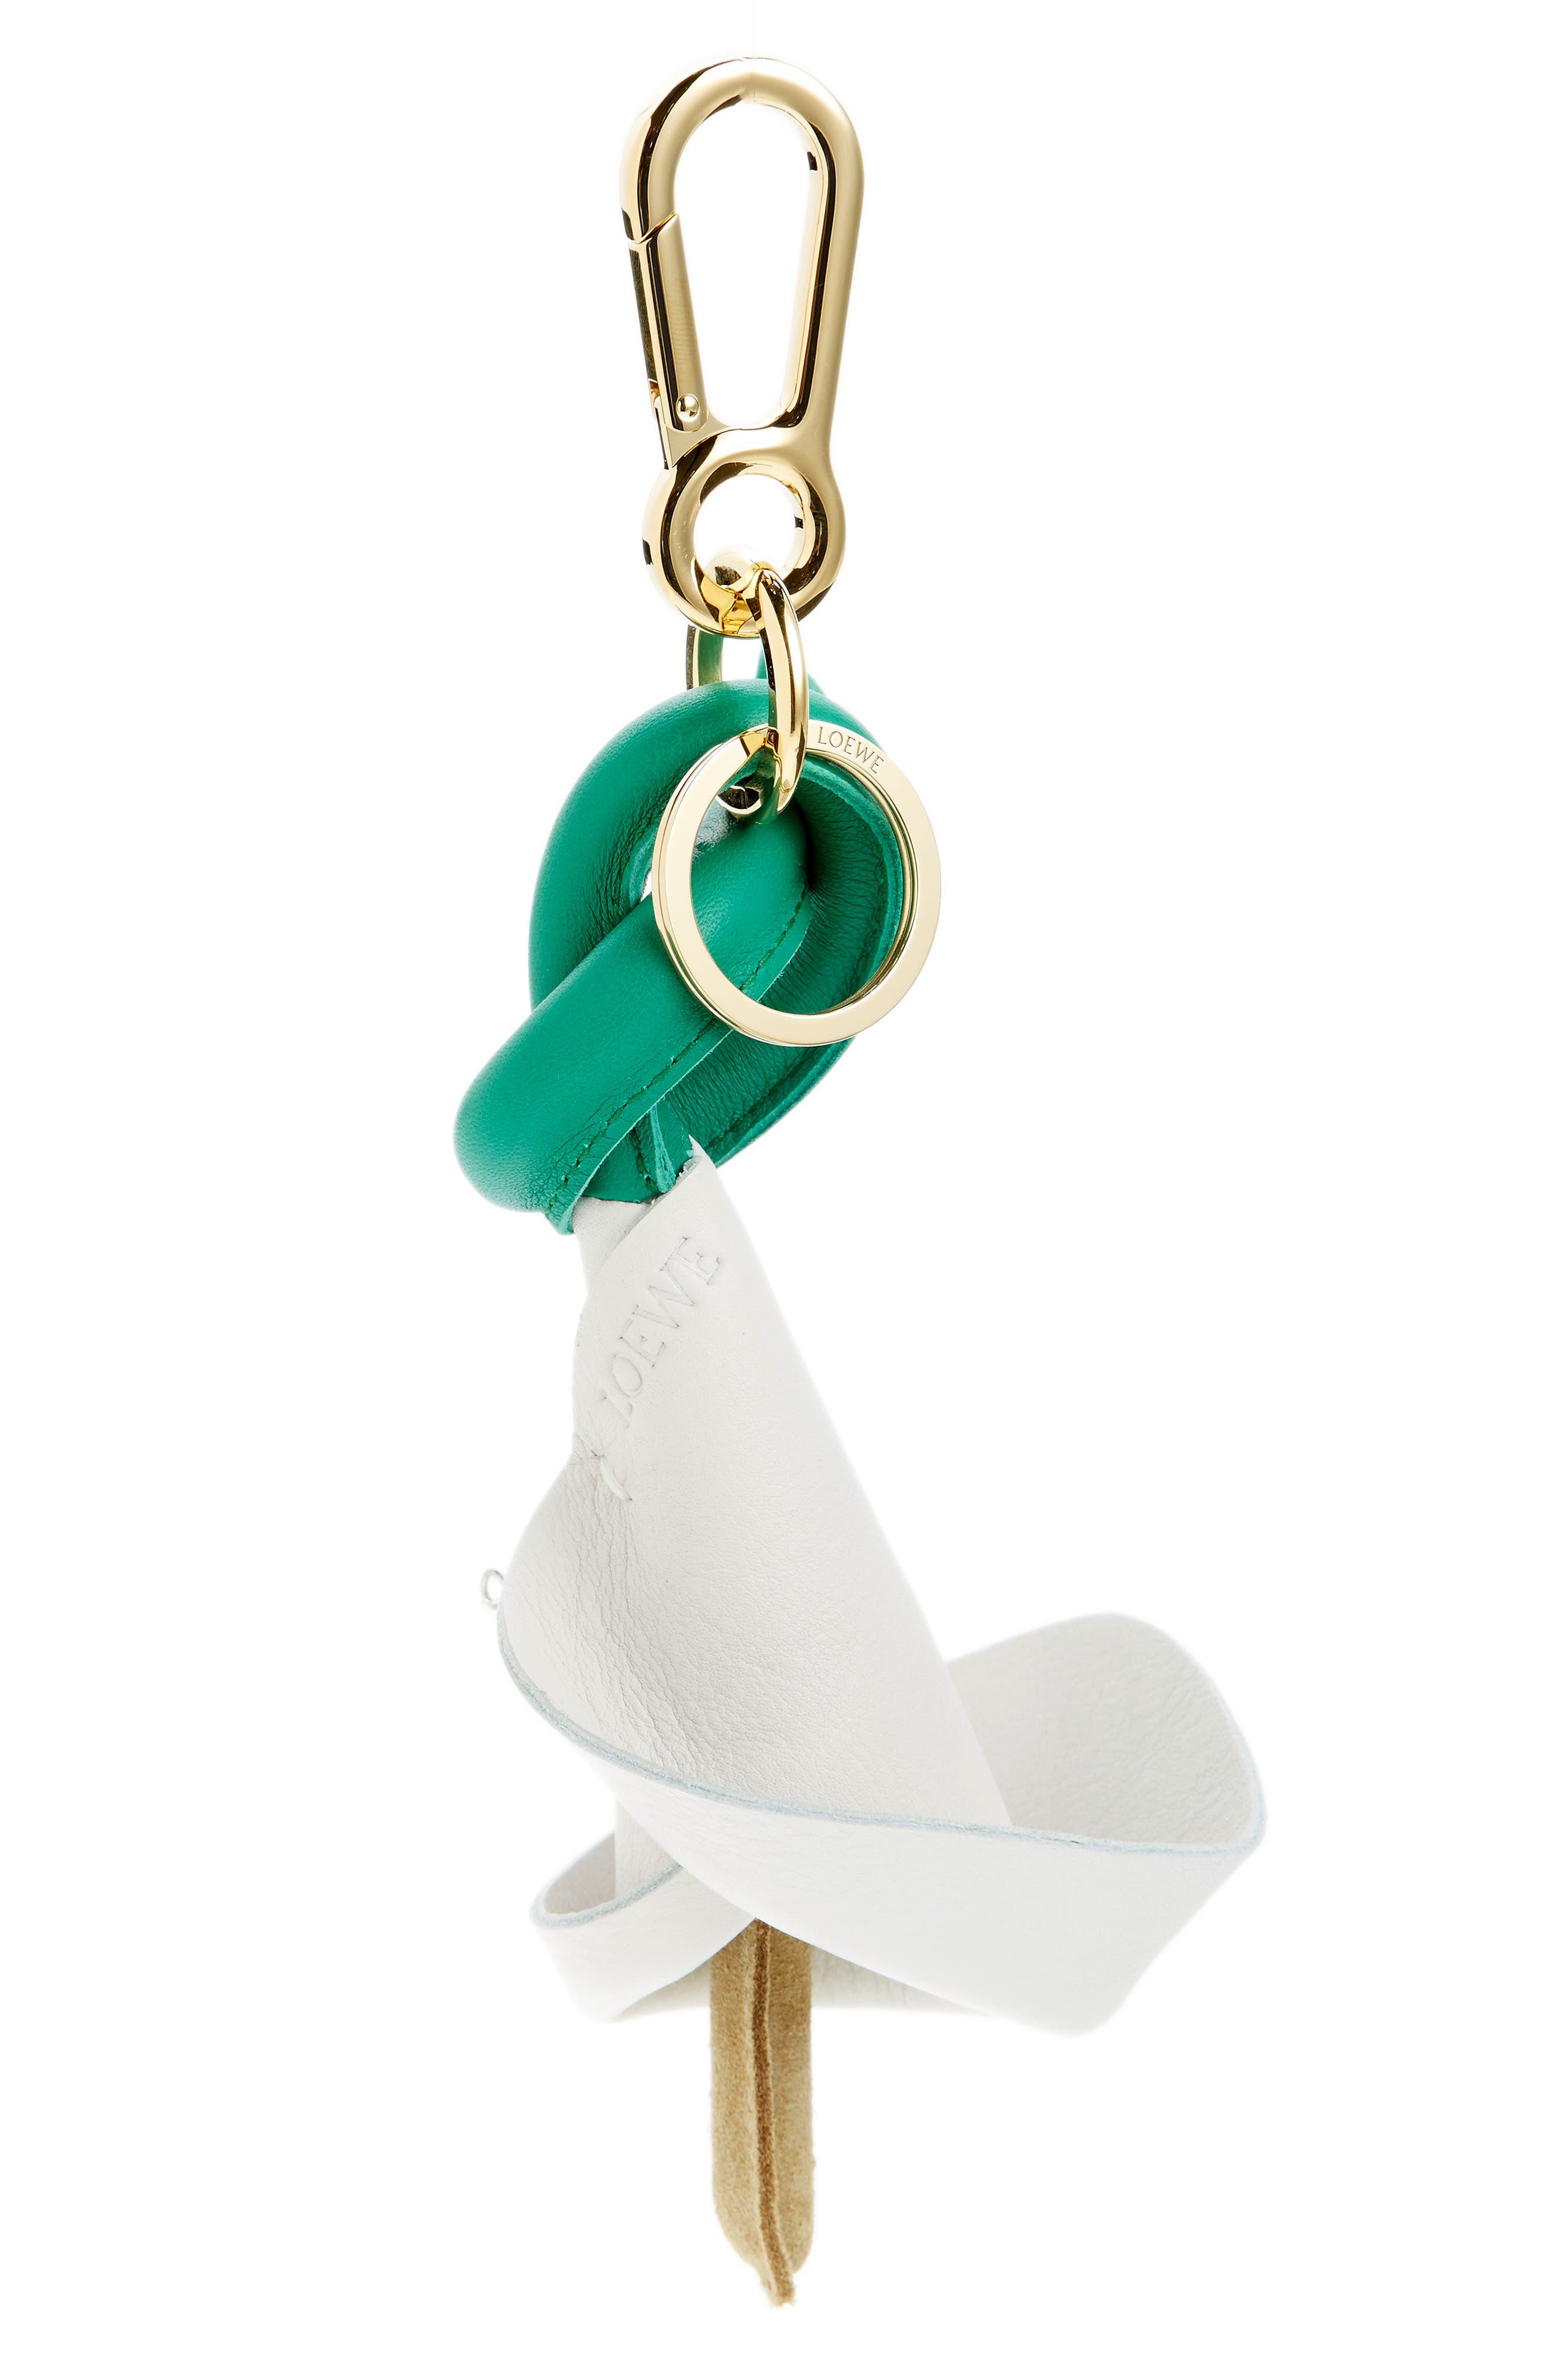 Loewe Calla Lily Bag Charm